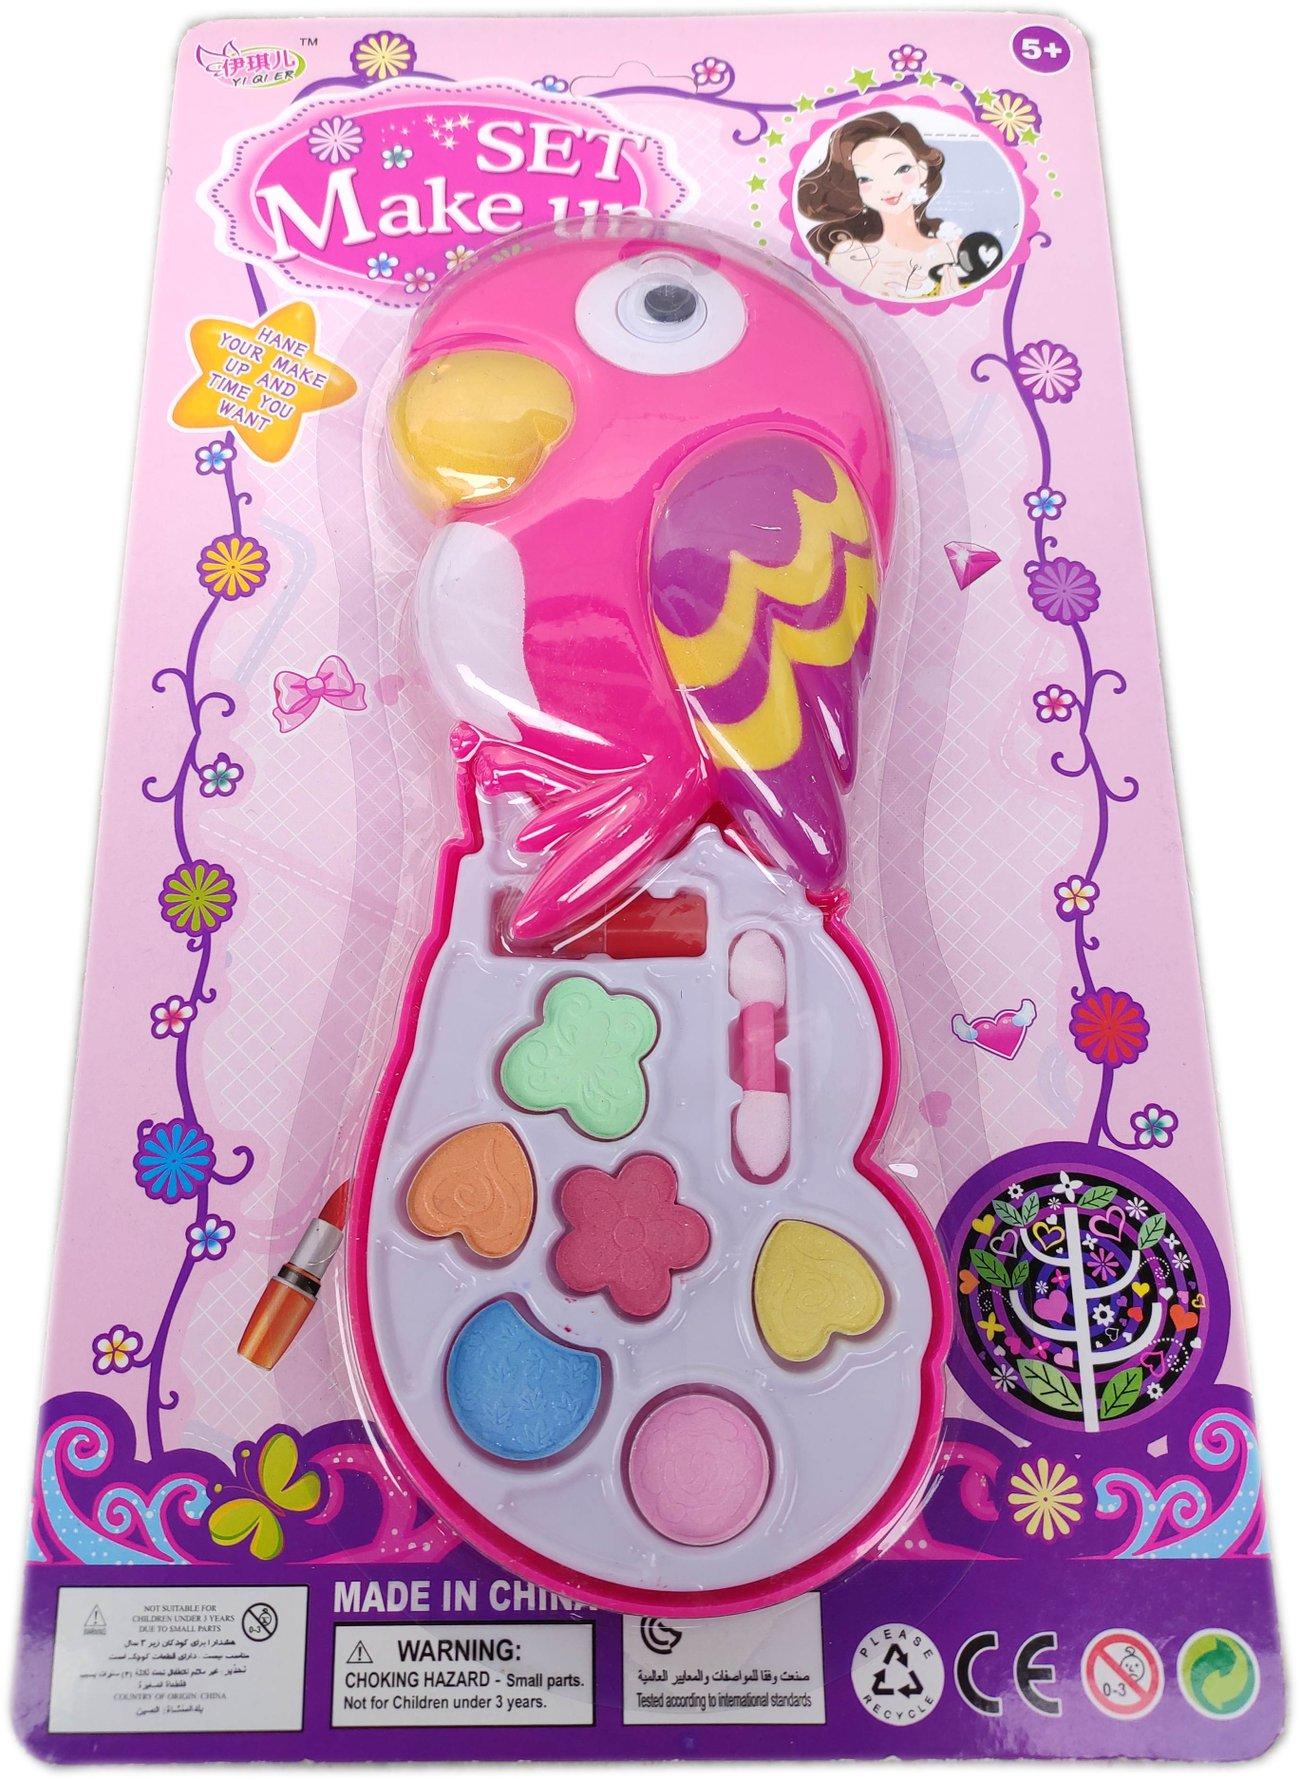 Детски Бюти комплект с грим за кукли с форма на Папагал